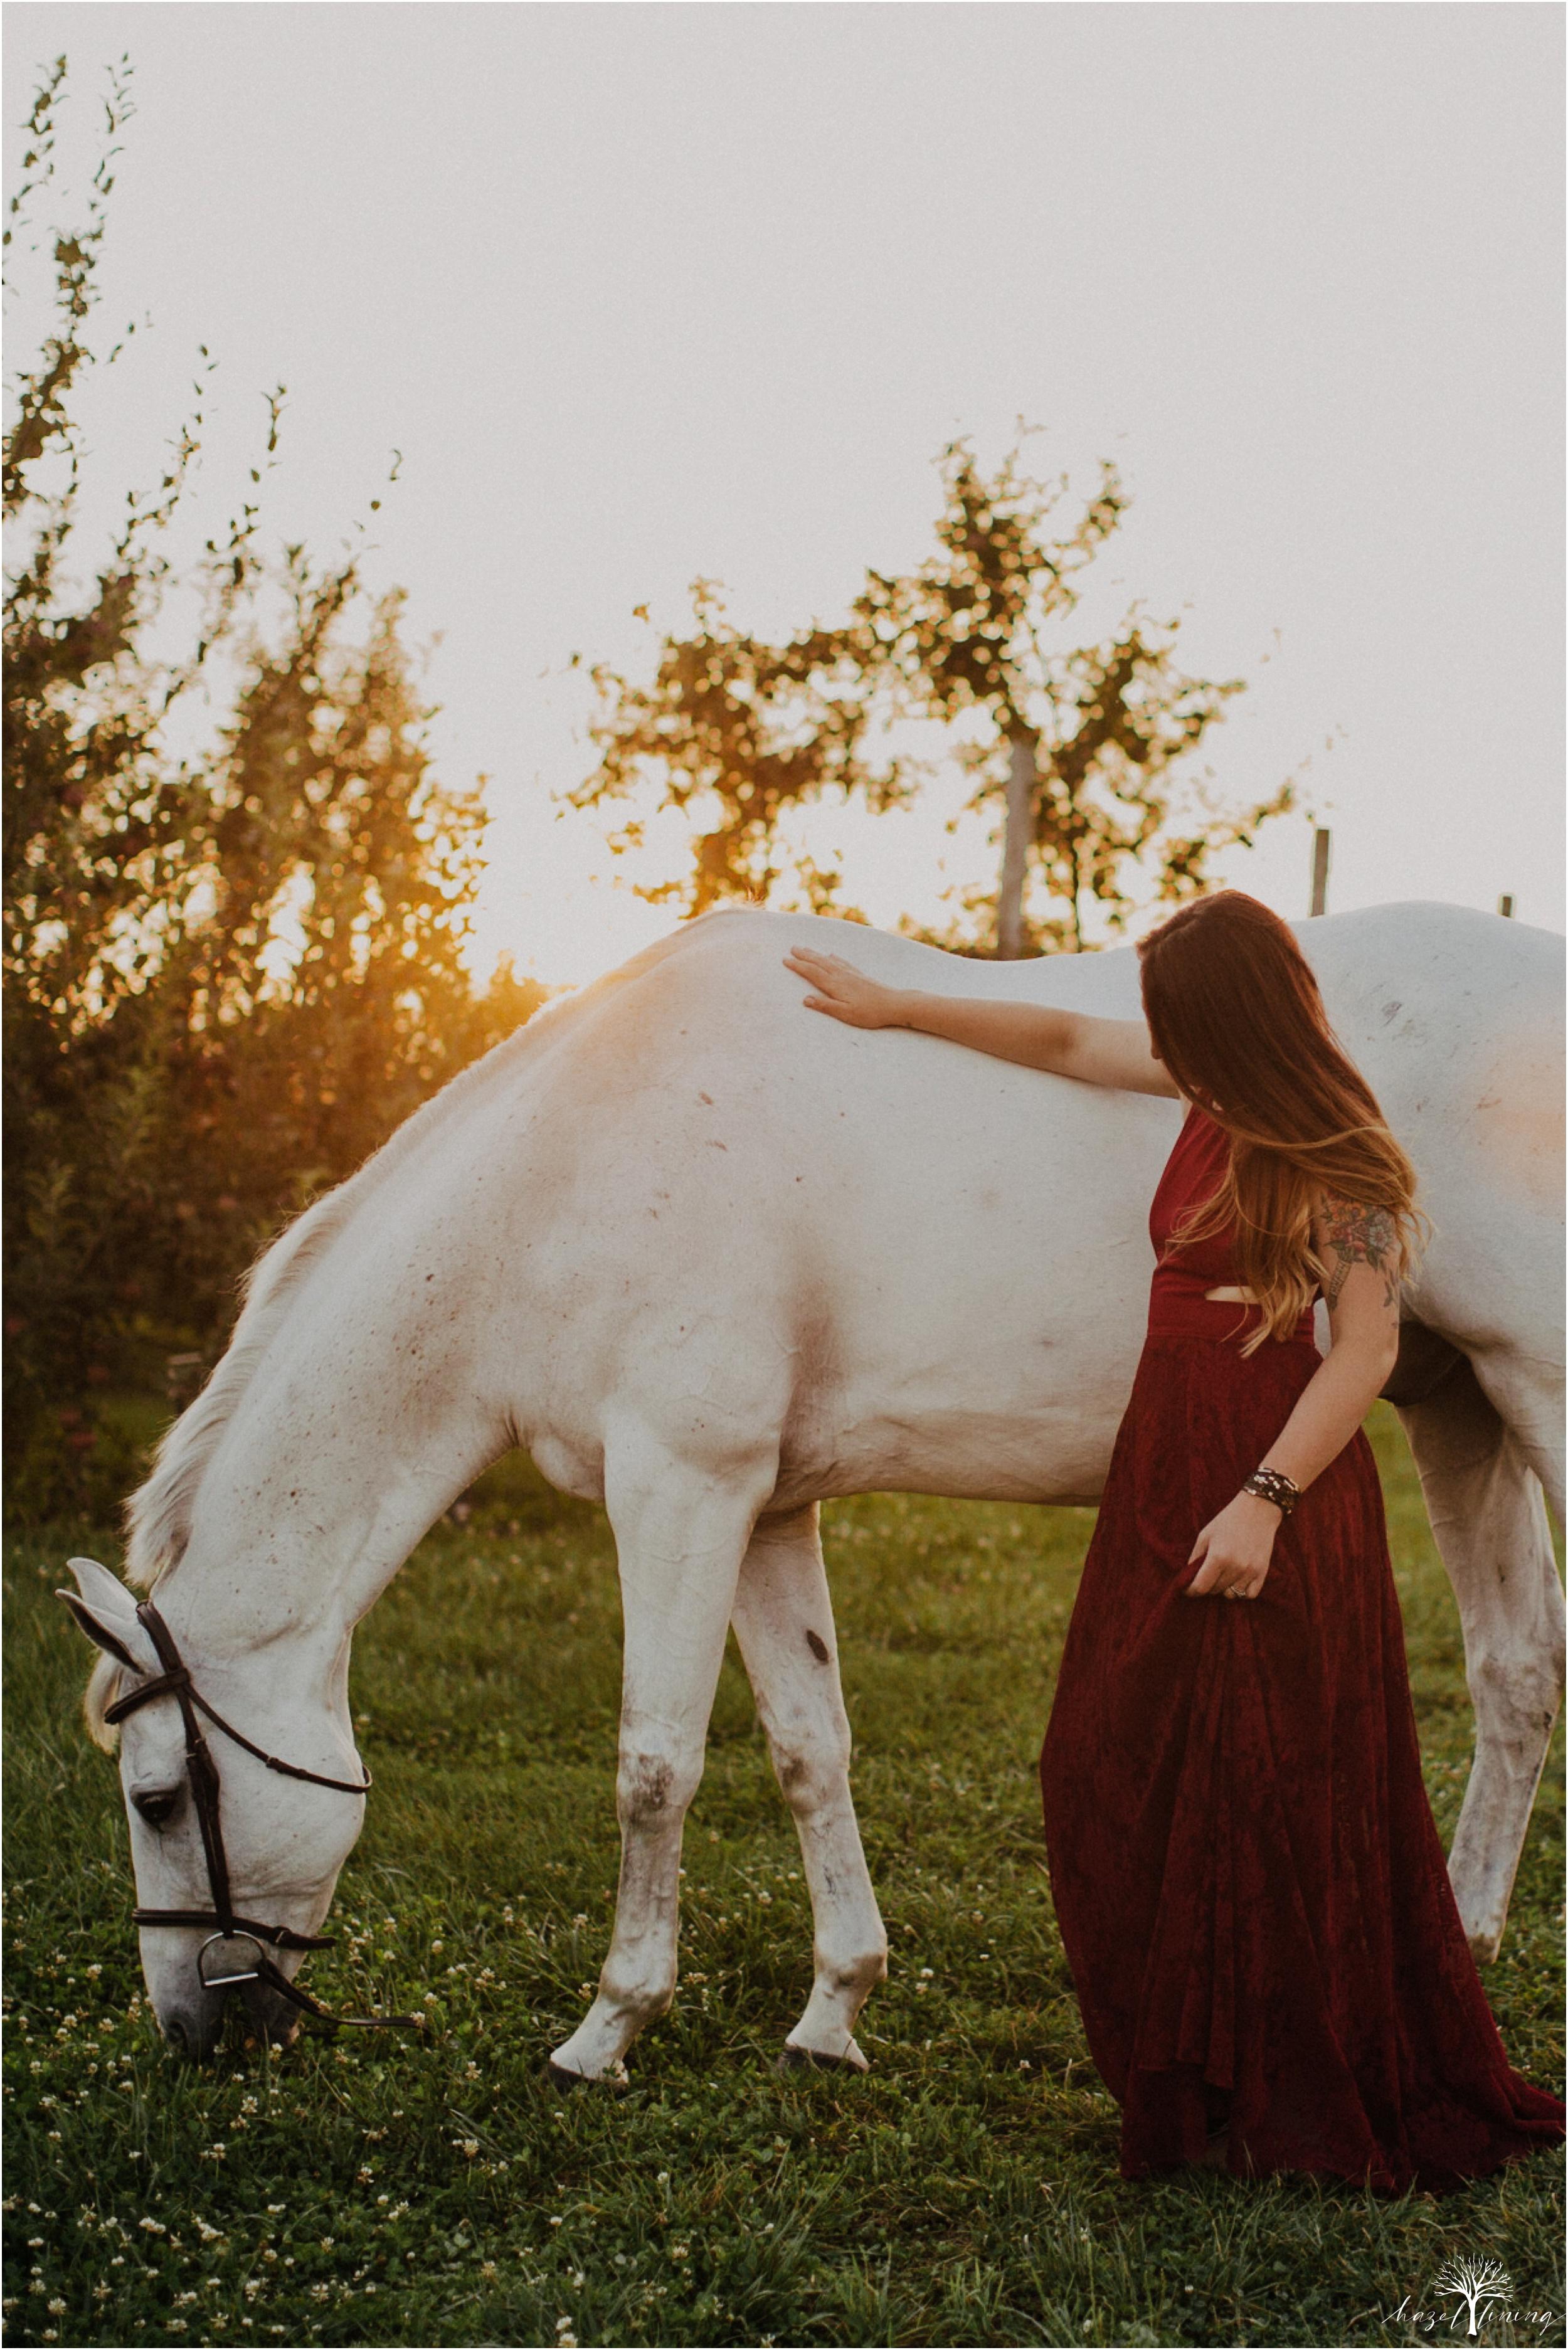 taylor-adams-and-horse-delaware-valley-university-delval-summer-equestrian-portrait-session-hazel-lining-photography-destination-elopement-wedding-engagement-photography_0073.jpg